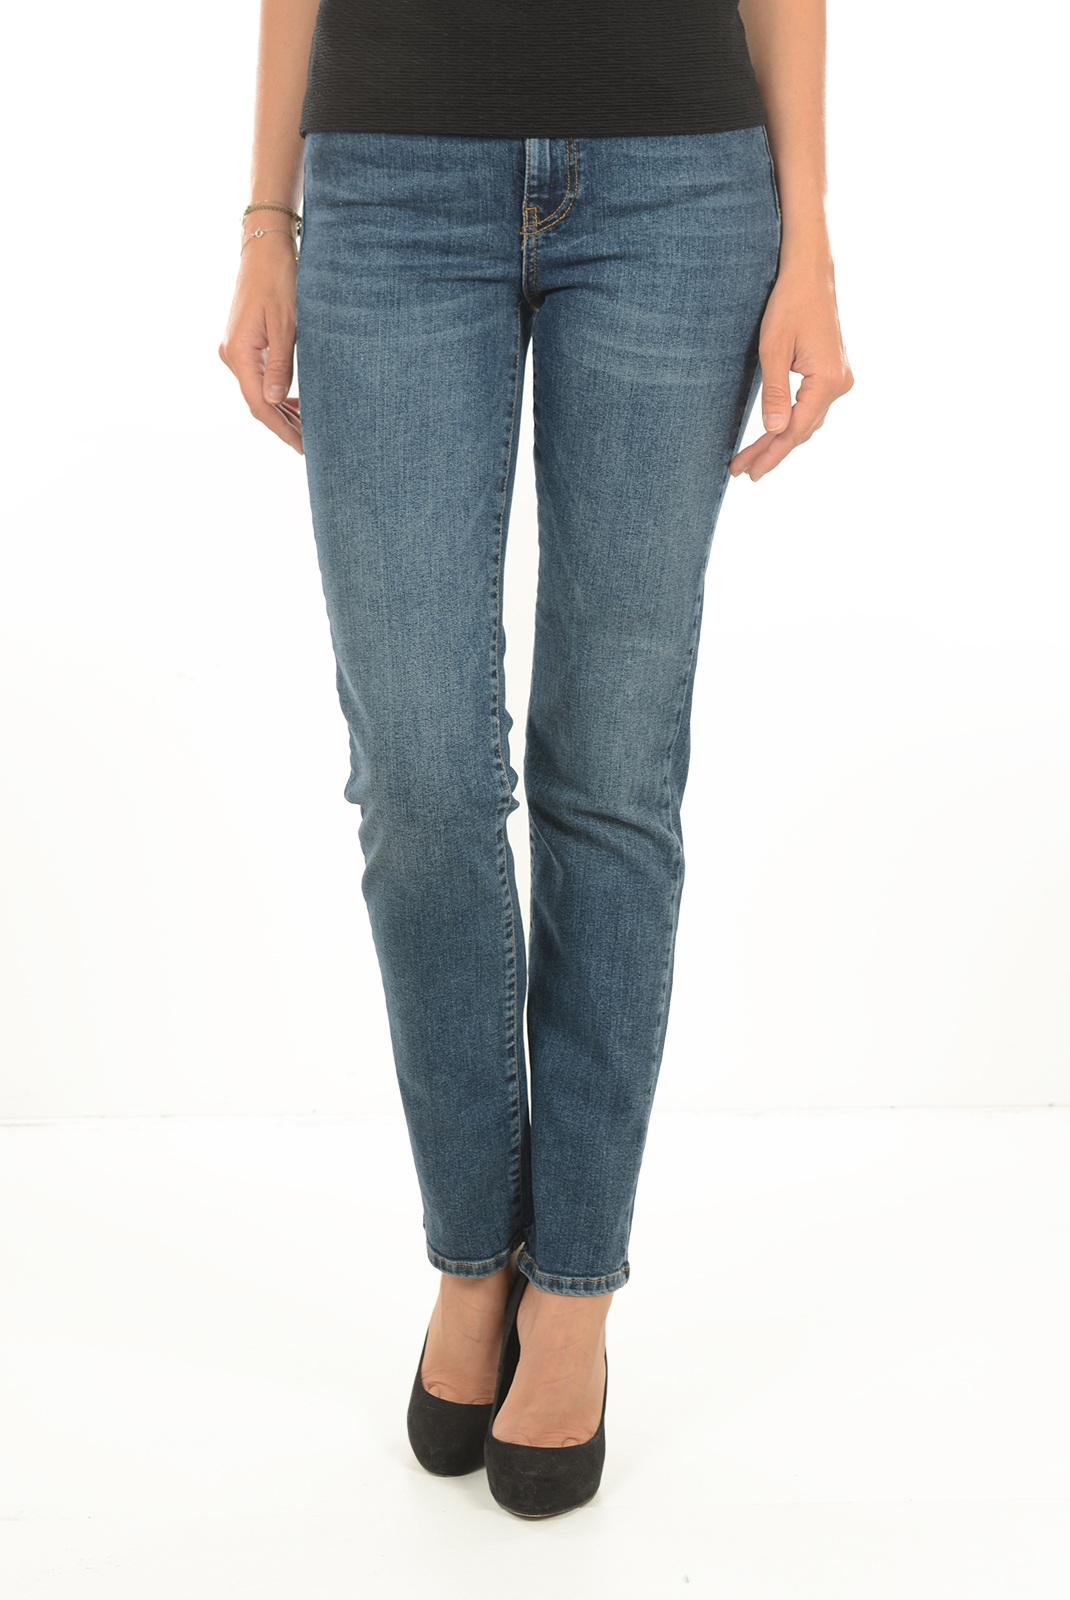 Jeans   Vero moda FIFTEEN STRAIGHT NW BA024 NOOS DENIM